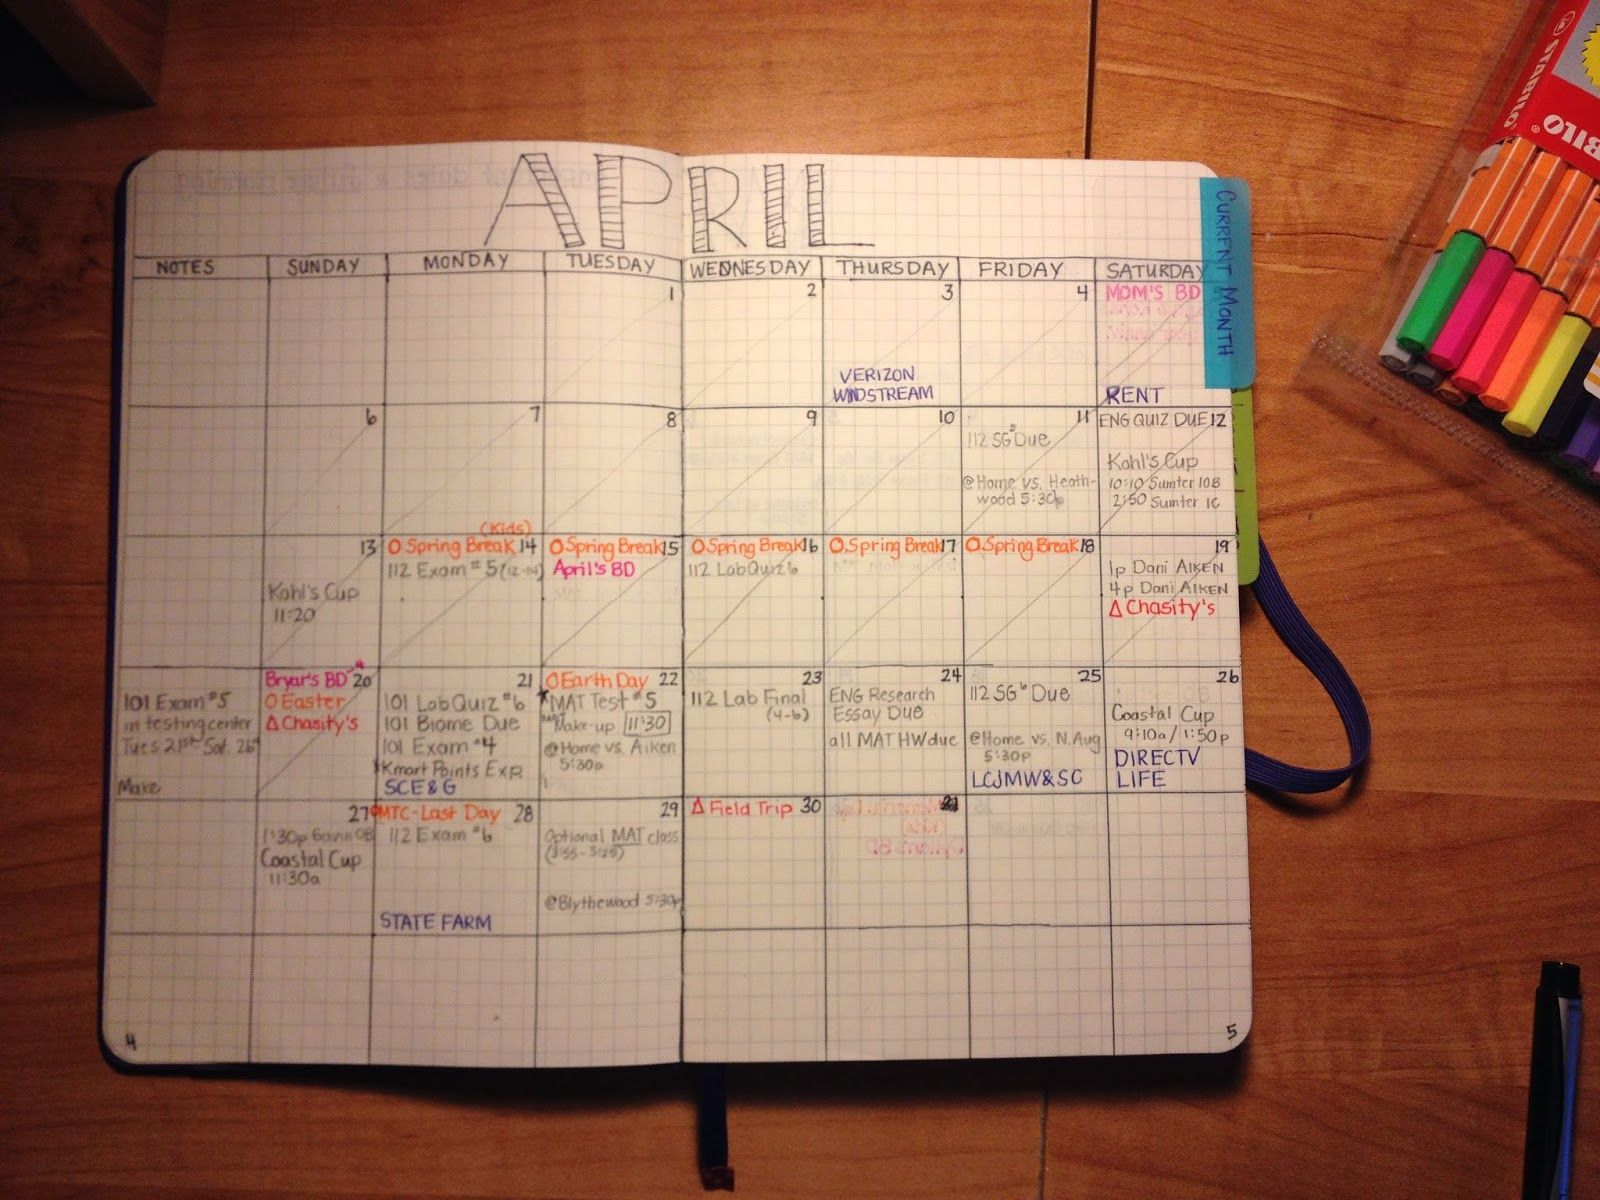 Calendar Planner Diy : Bullet journal monthly calendar future planning solved